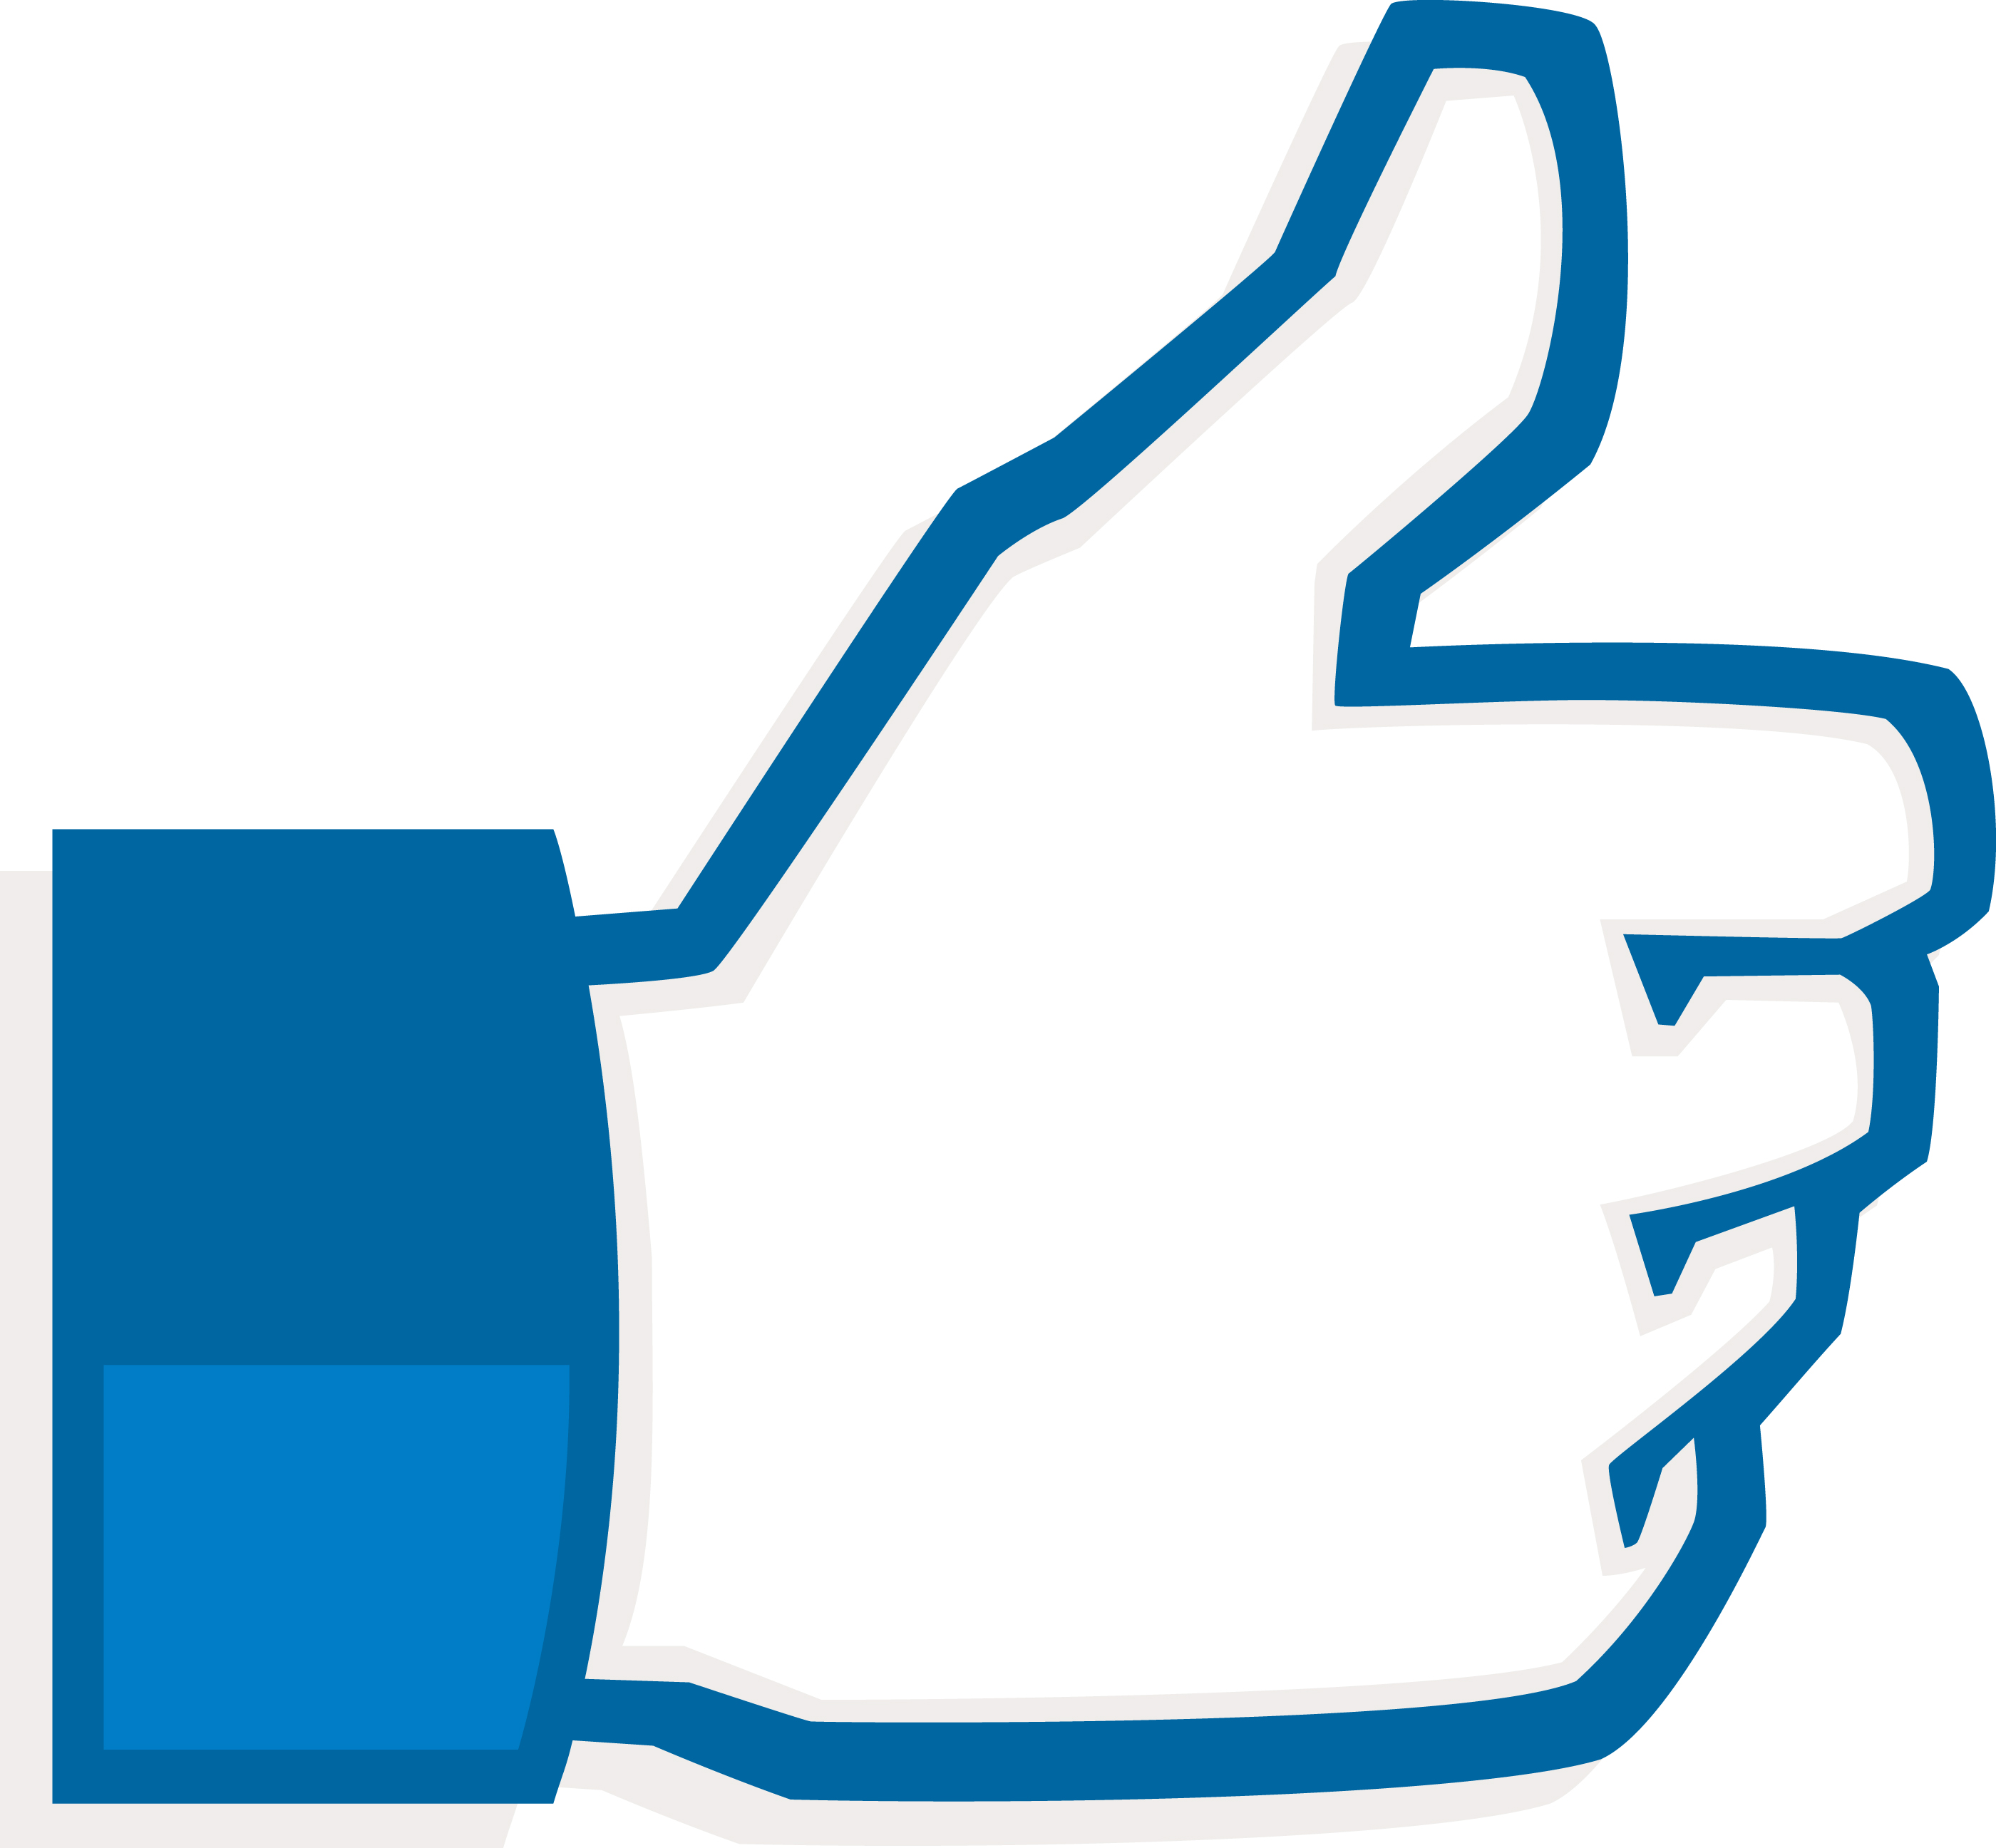 Clipart facebook dislike logo freeuse library Facebook like button clipart - ClipartFest freeuse library